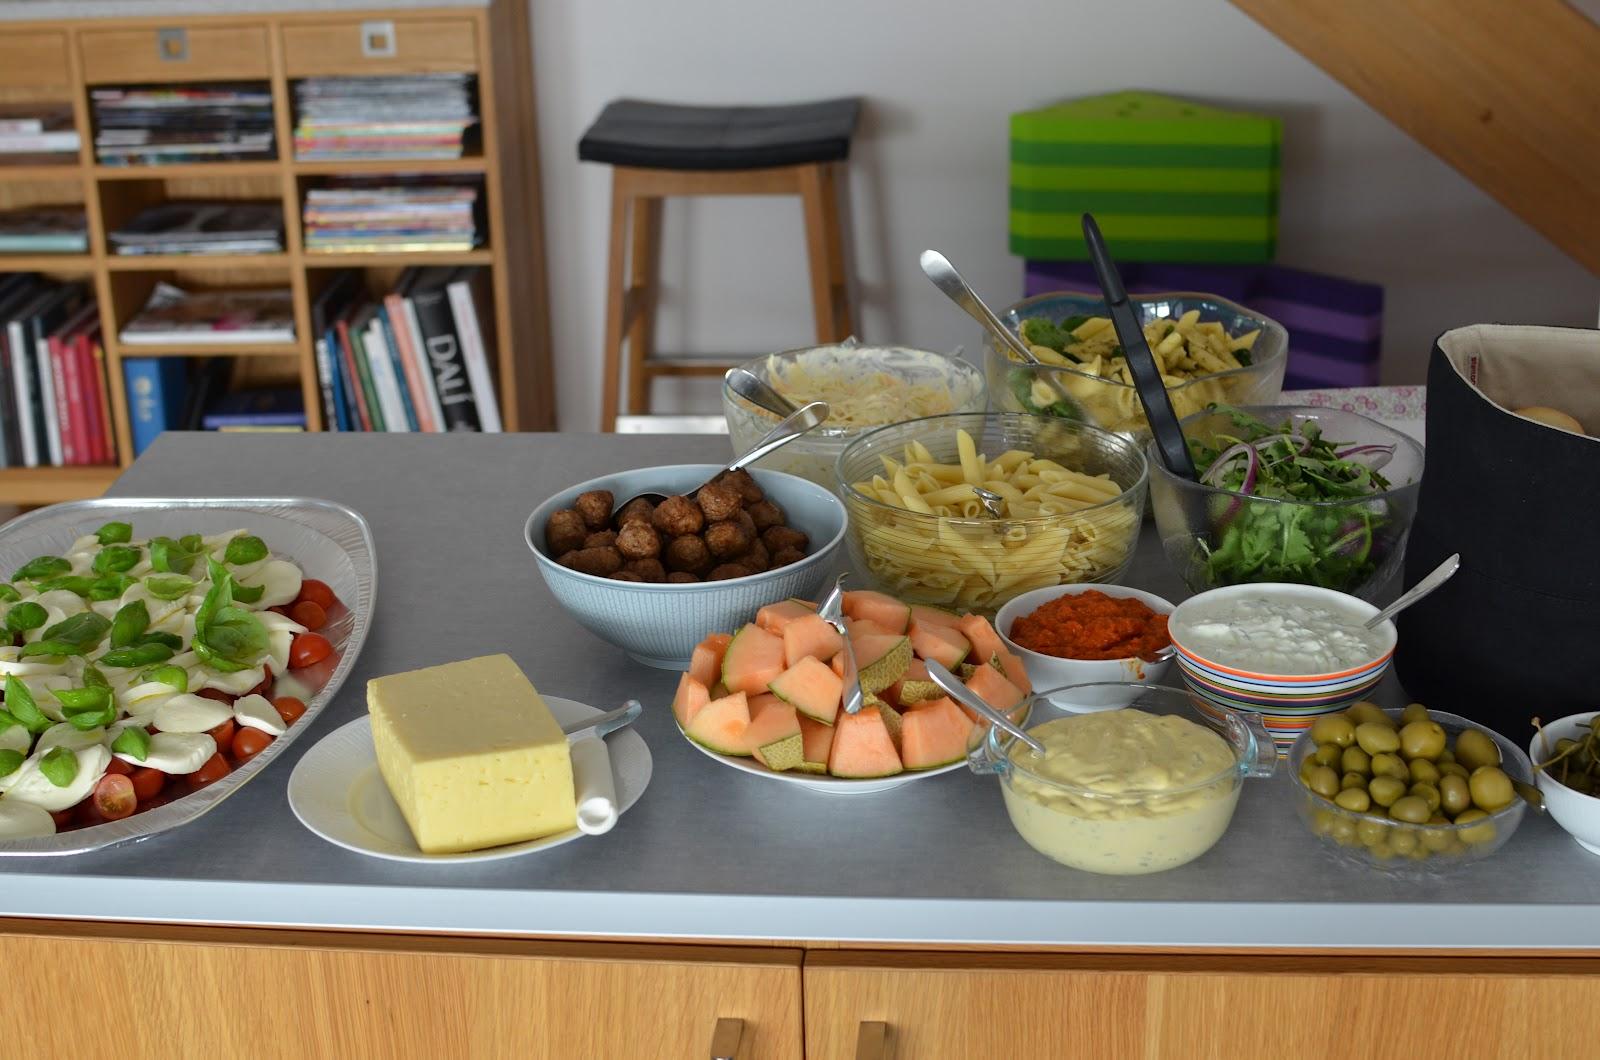 40 års fest mat Elizabet's Hood: maj 2012 40 års fest mat